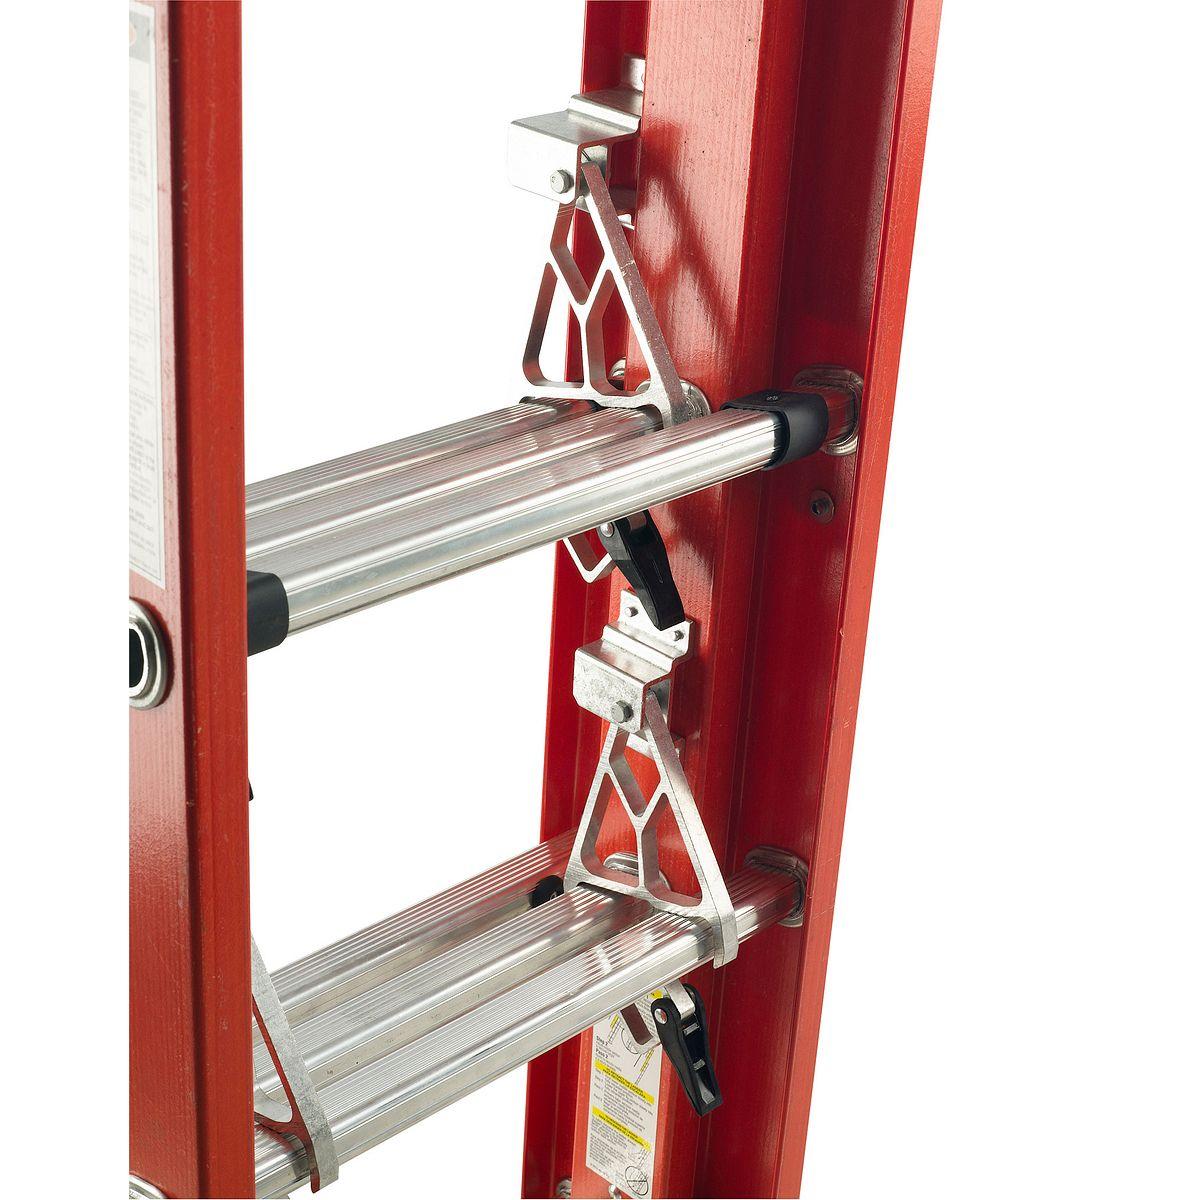 32 Foot Extension Ladder Best Ladder 2017